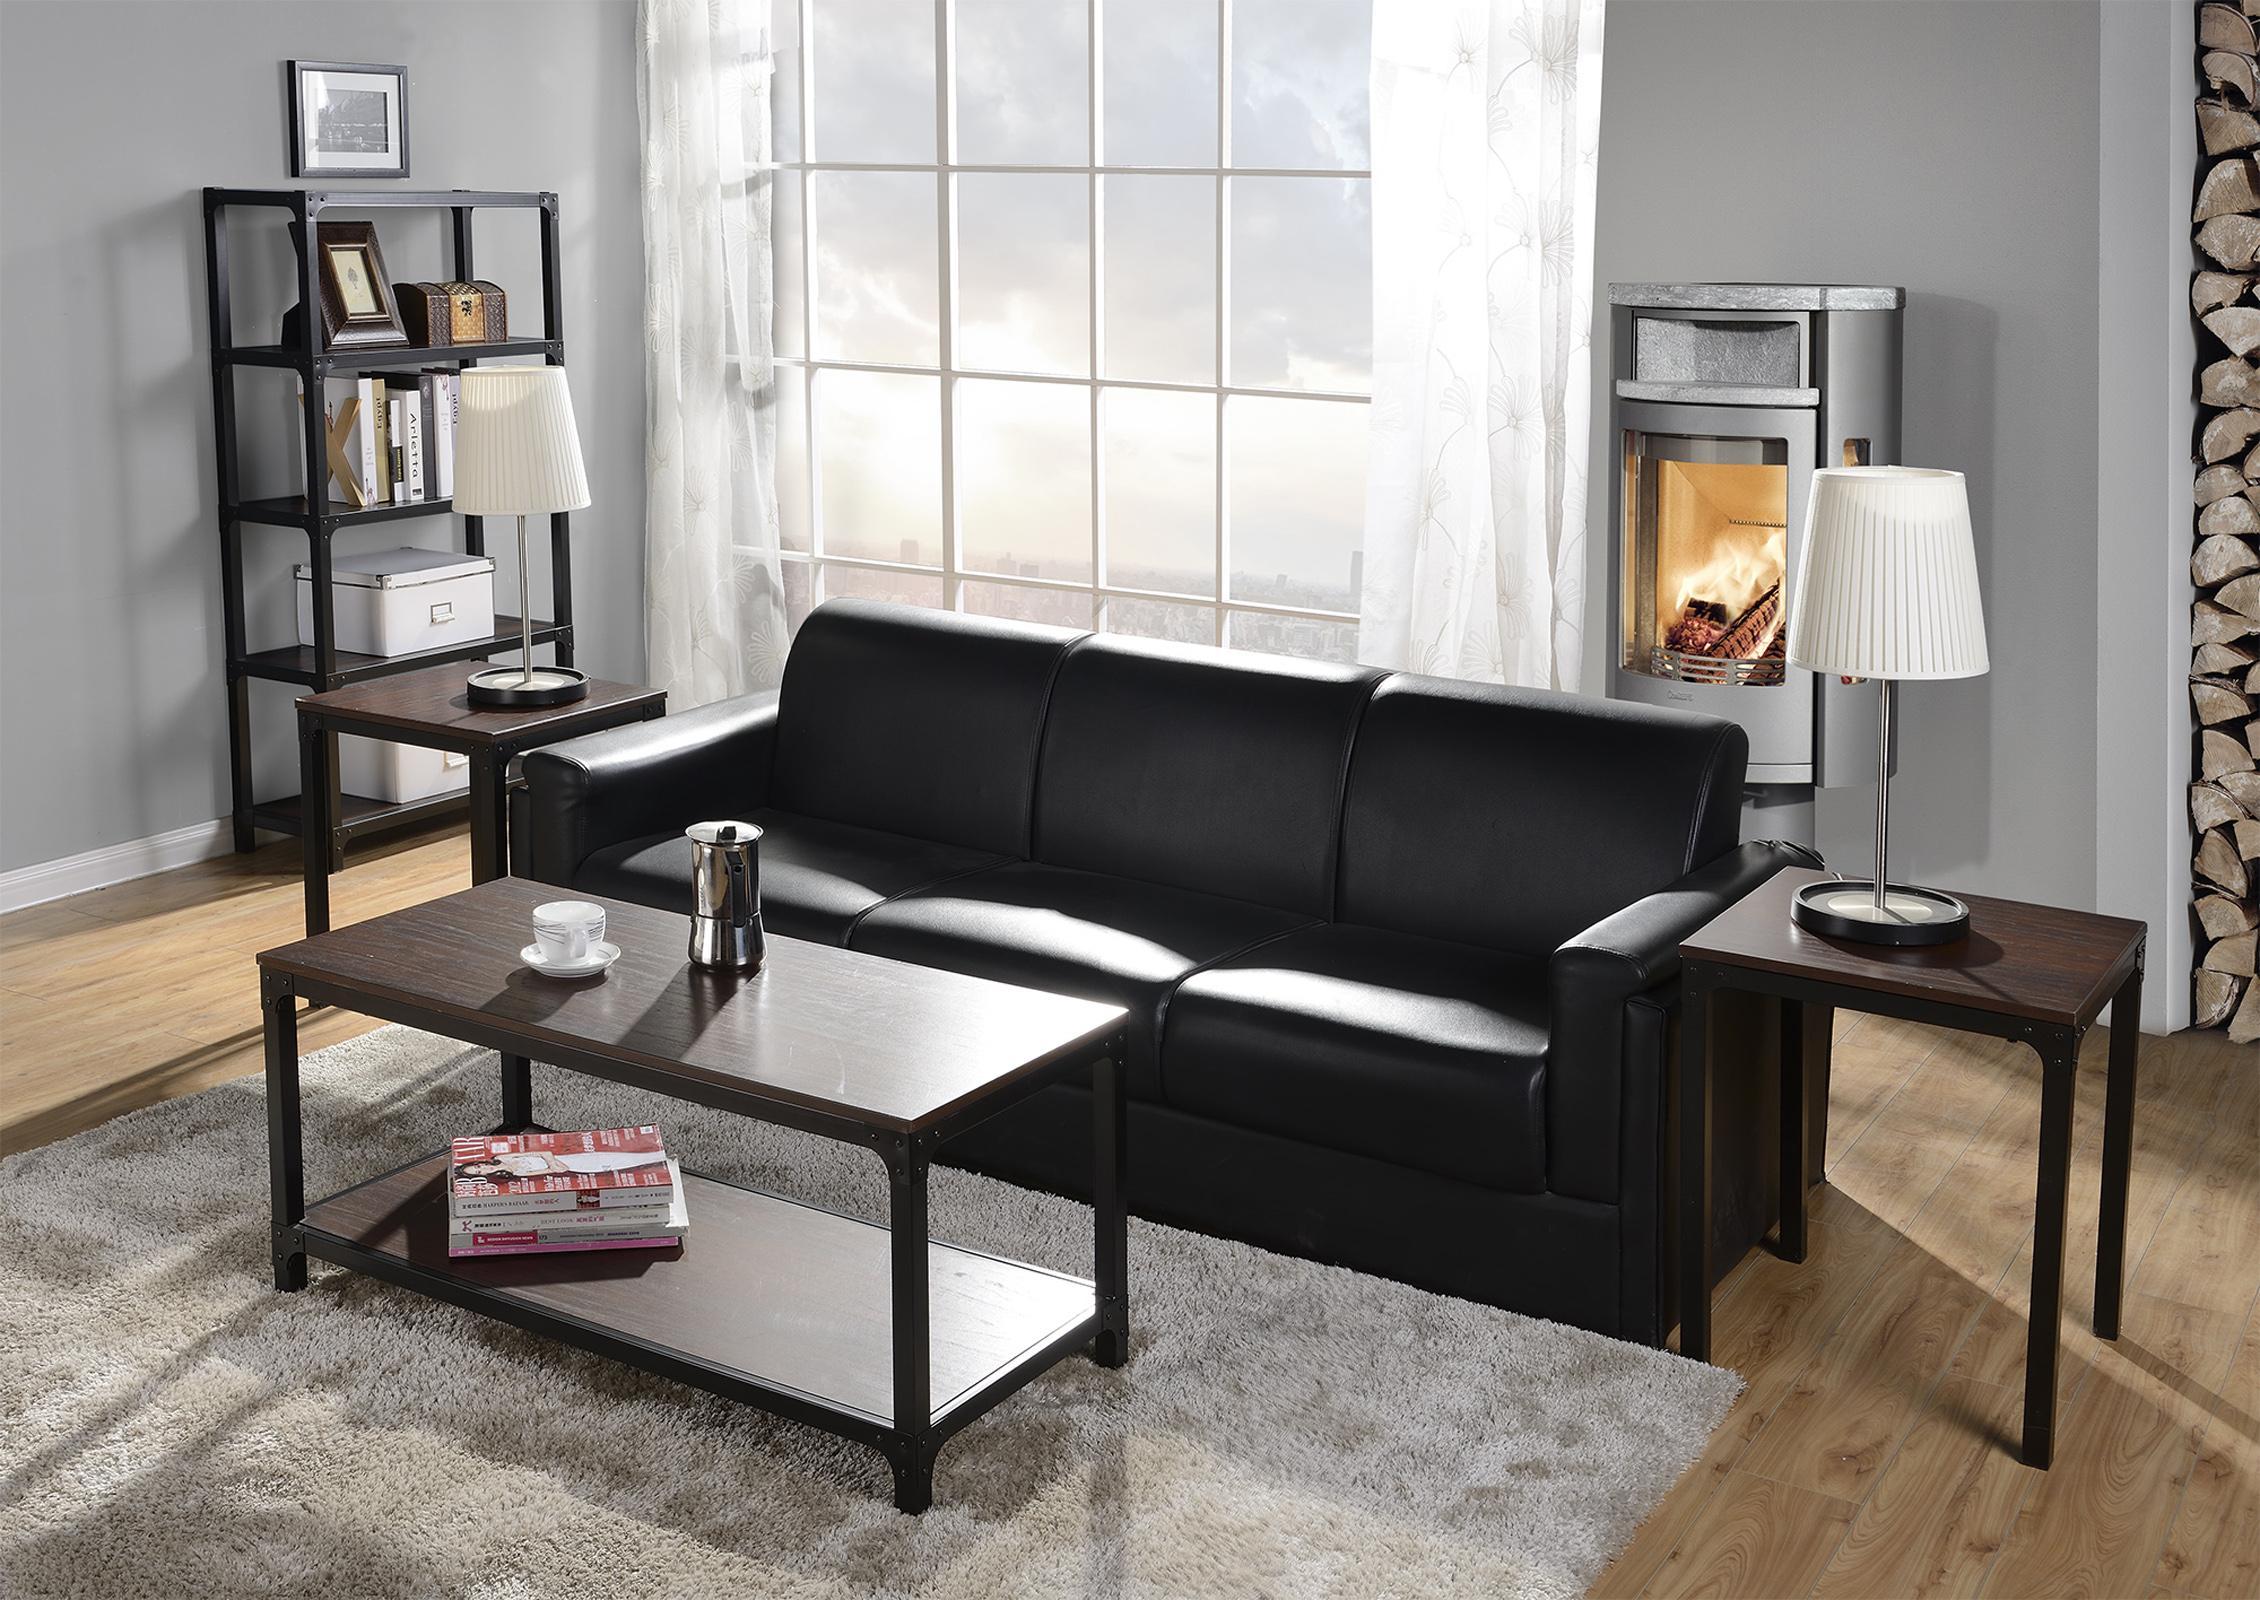 Homestar 3 PC Coffee Table & Side Table Set